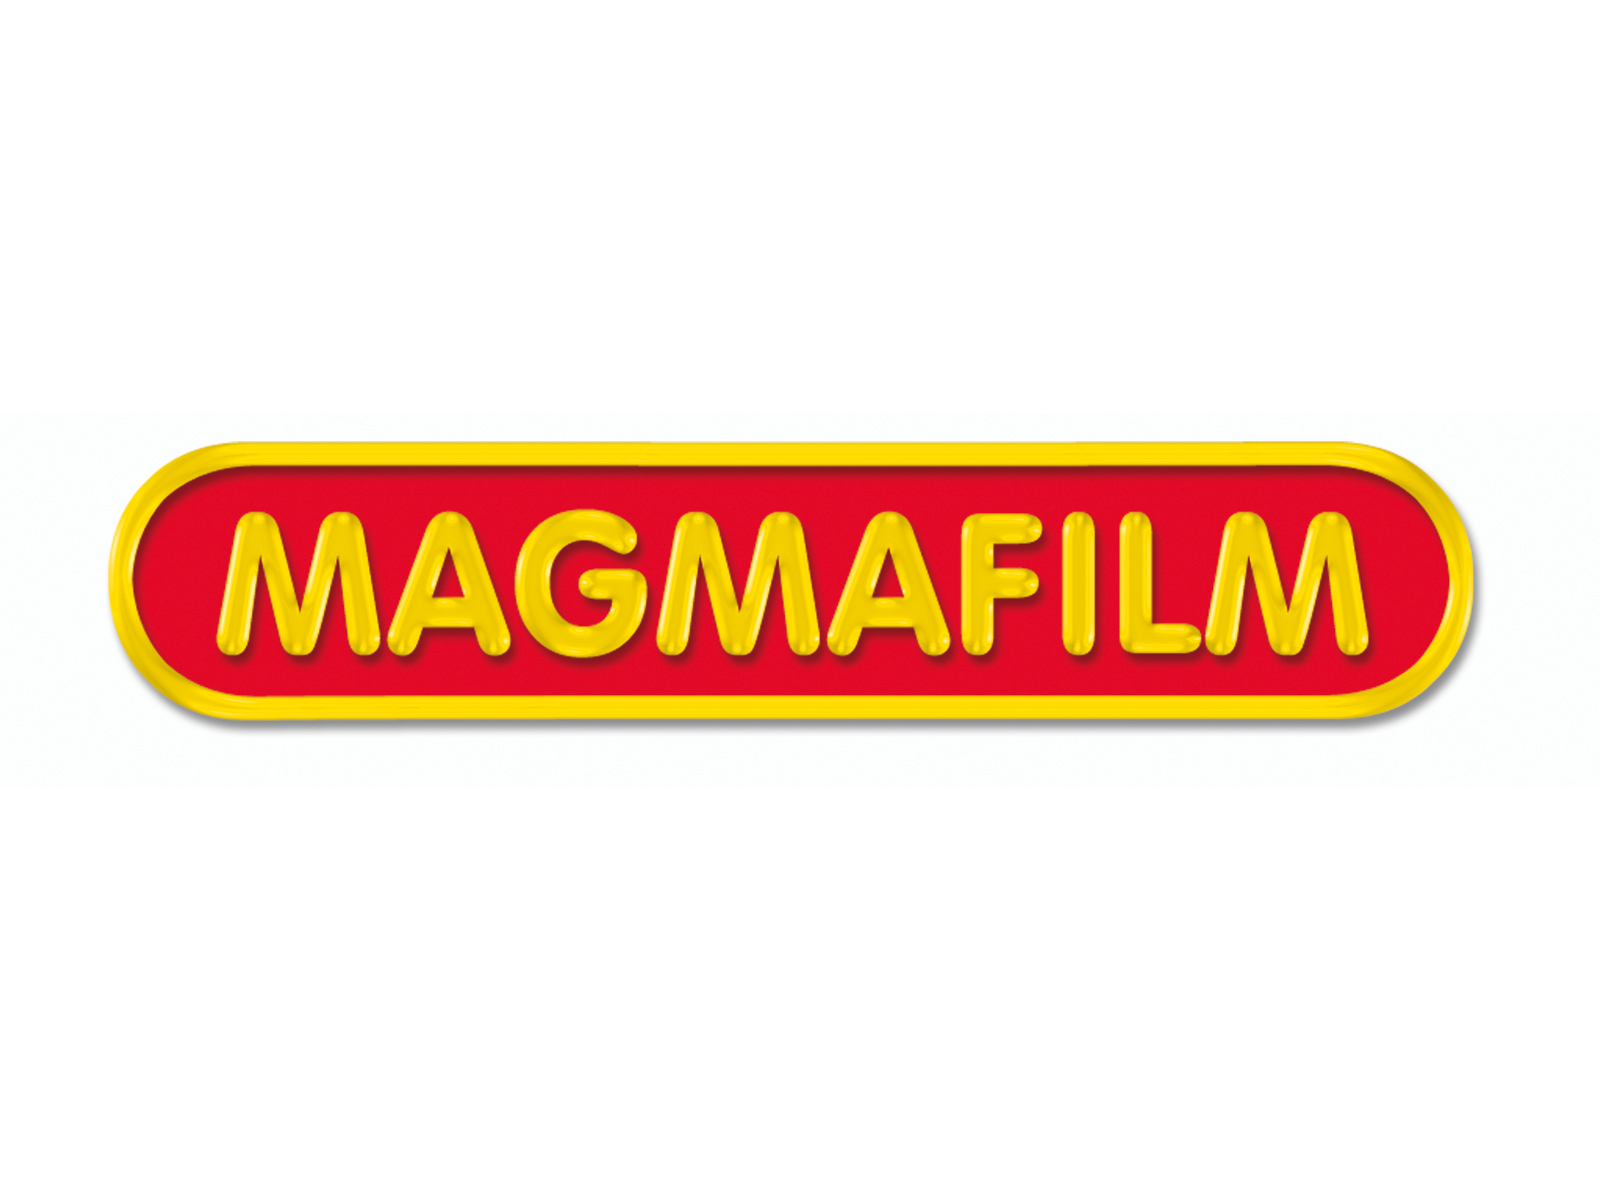 Magmafilme